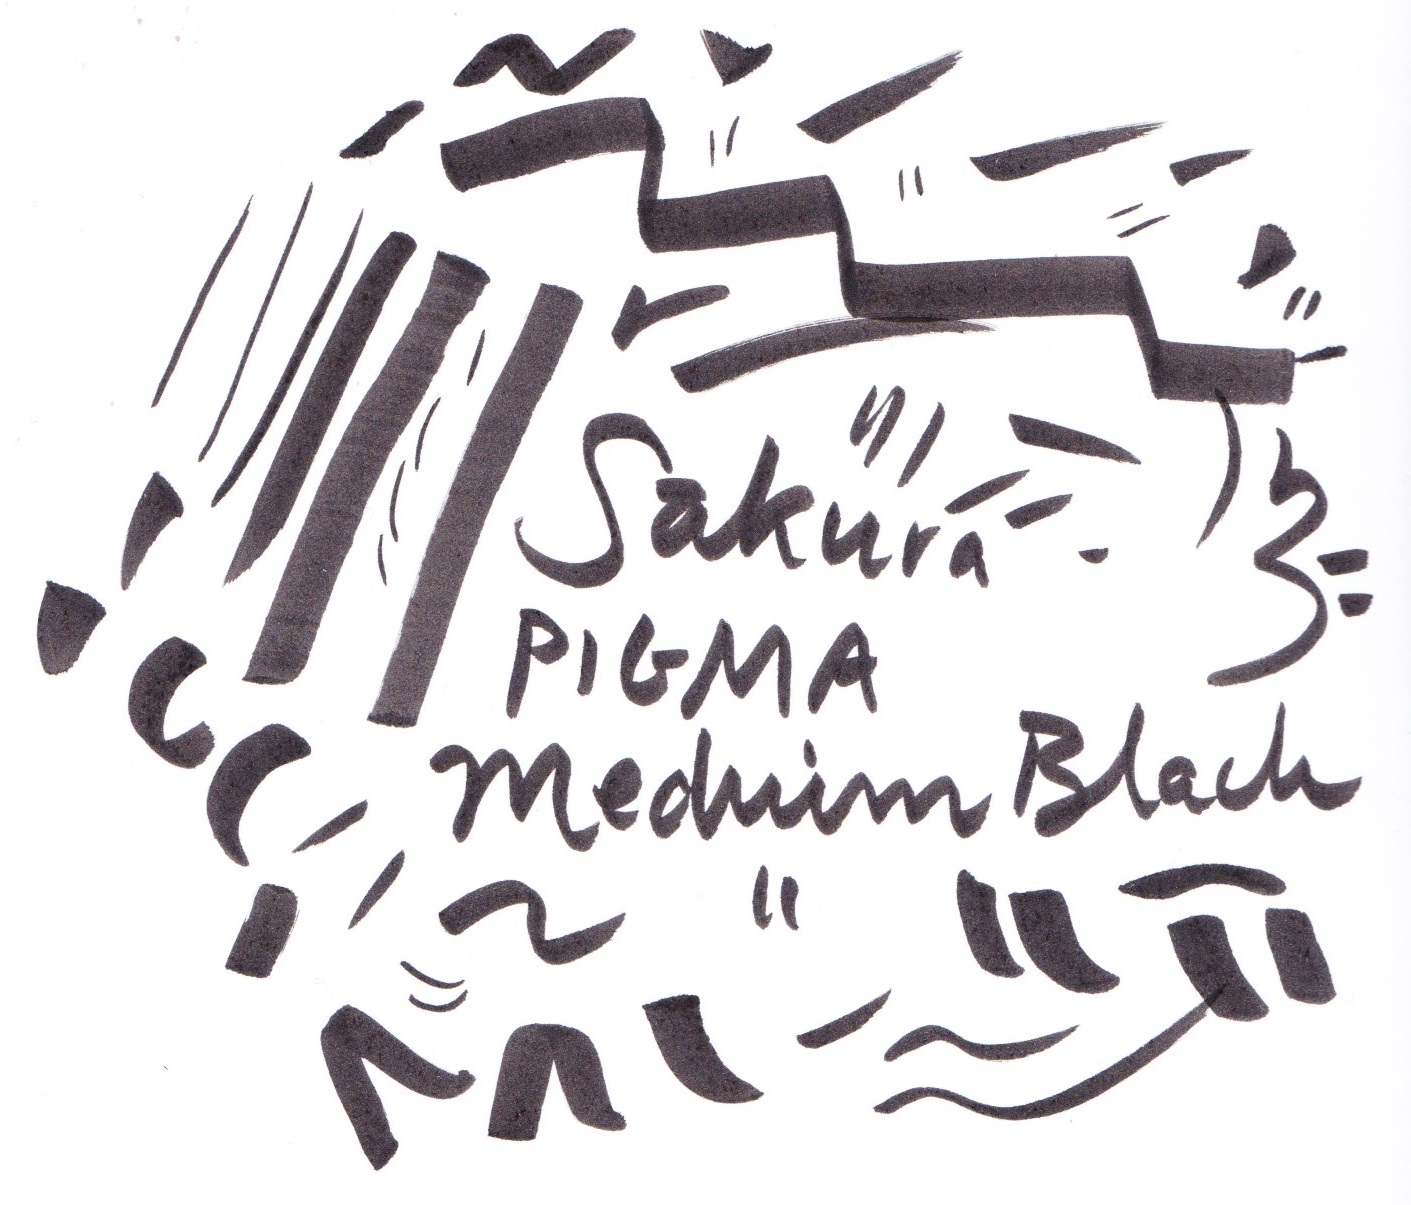 Sakura Pigma Medium nib on Bristol board